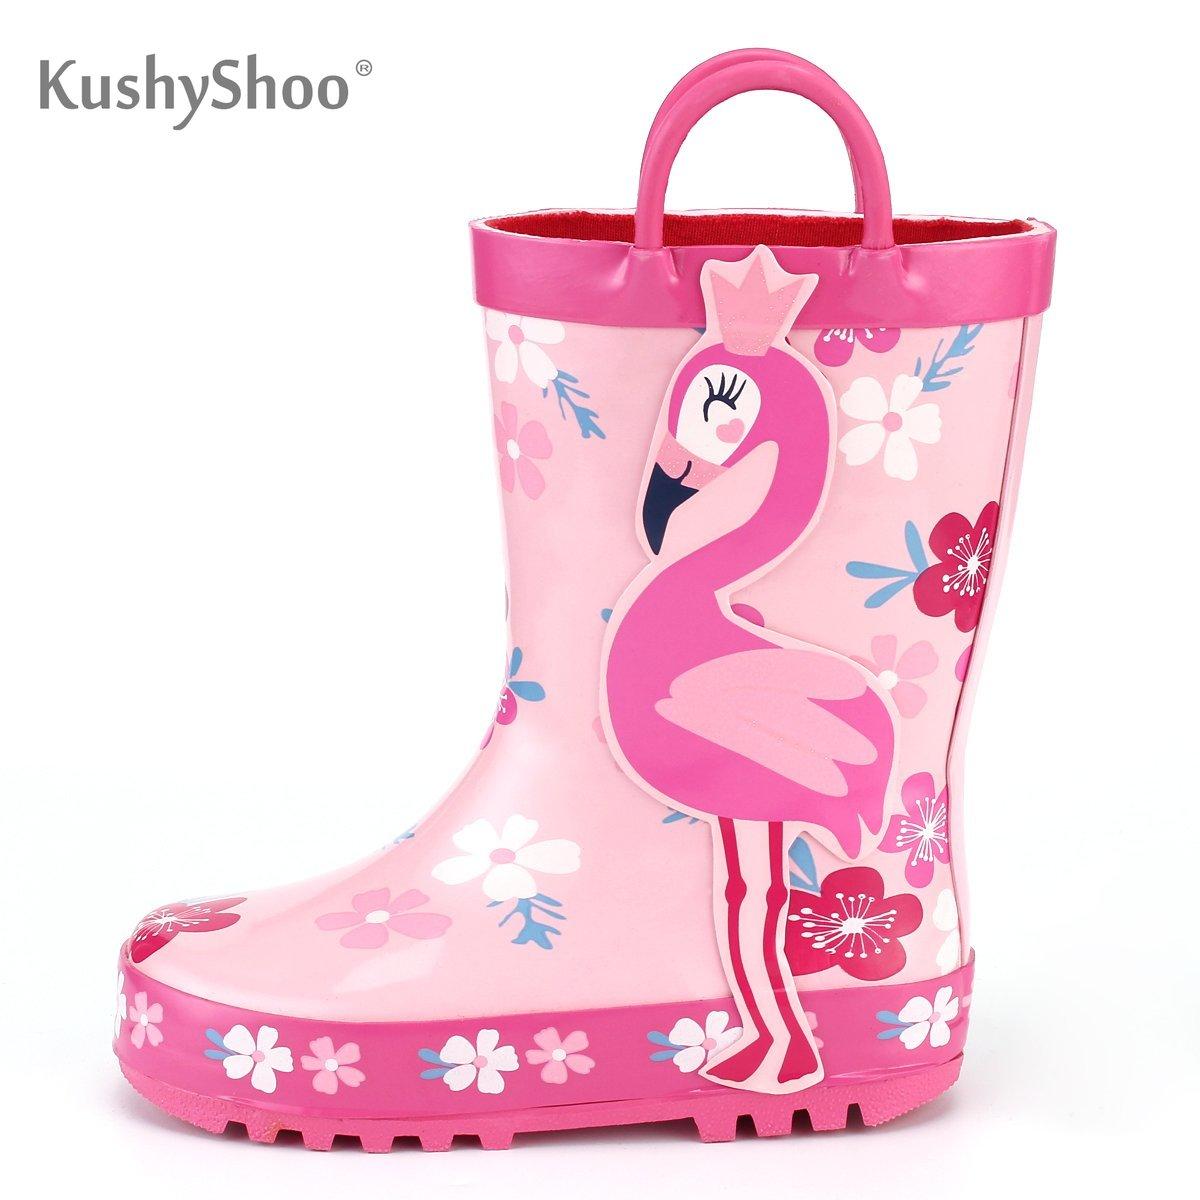 KushyShoo Children's Rubber Boots Outdoor Waterproof 3D Flamingo Printing Rain Boots Kids Toddler Water Boots Kalosze Dla Dzieci